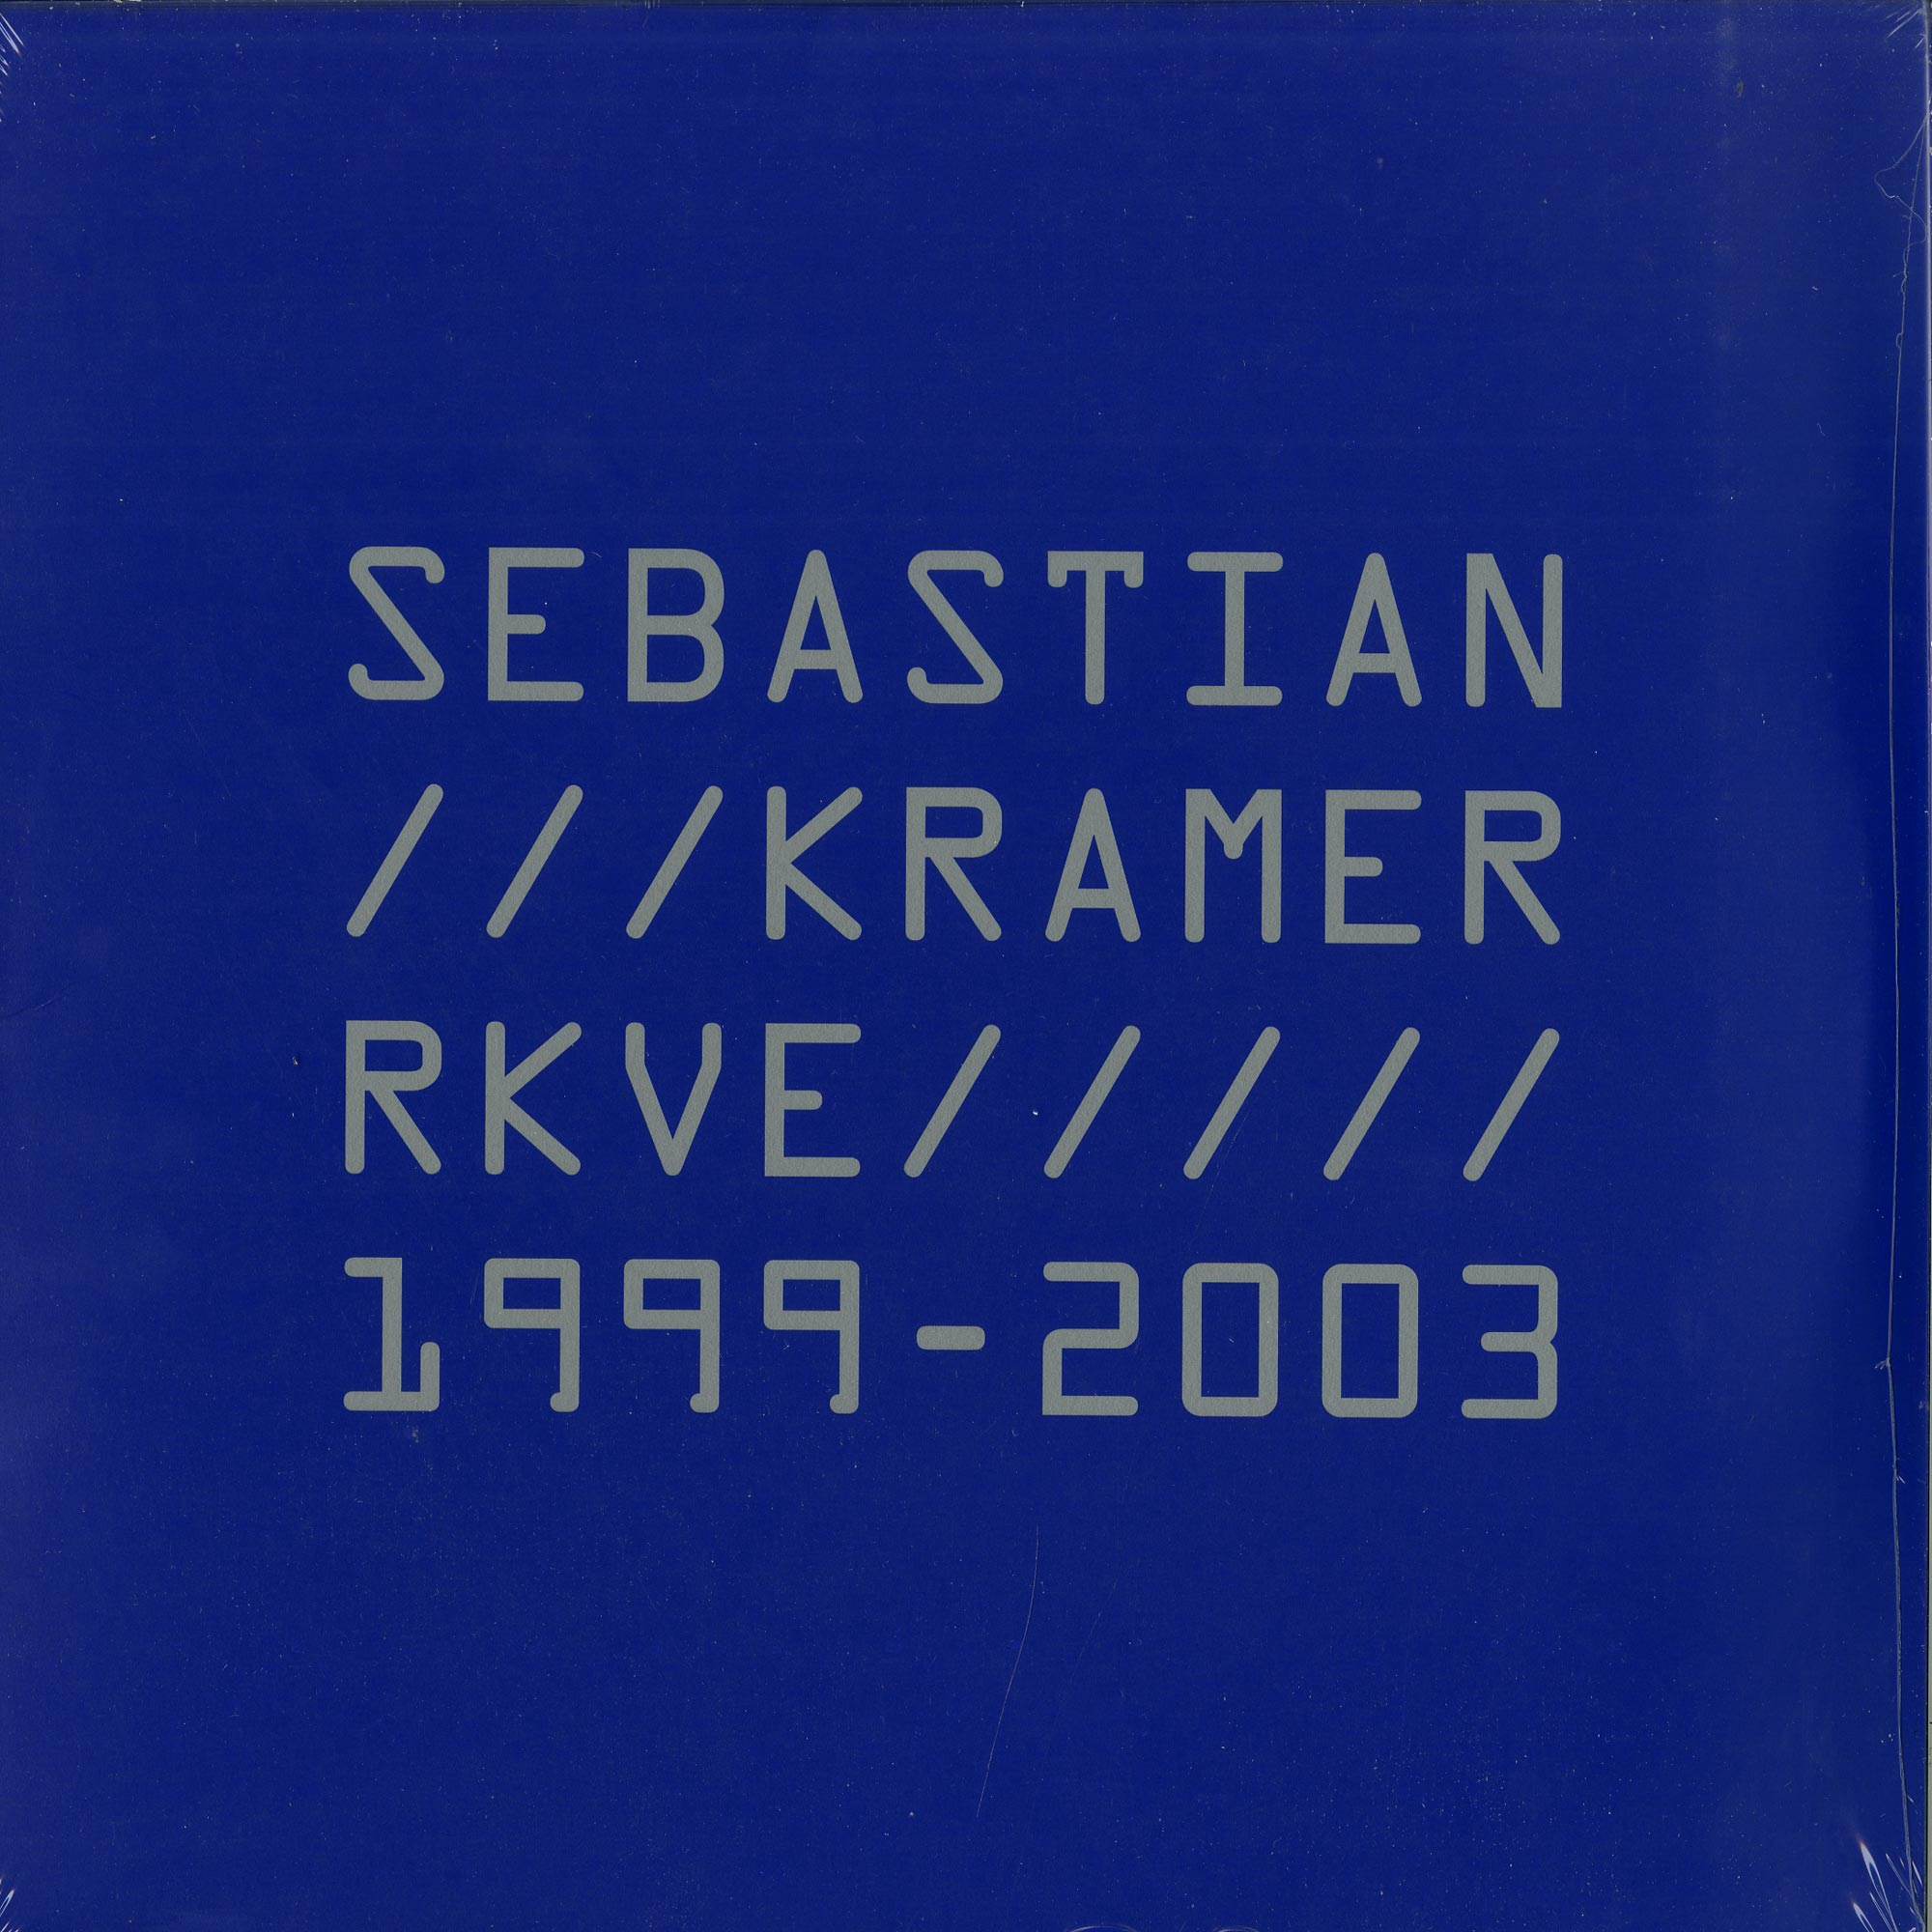 Sebastian Kramer - RKVE